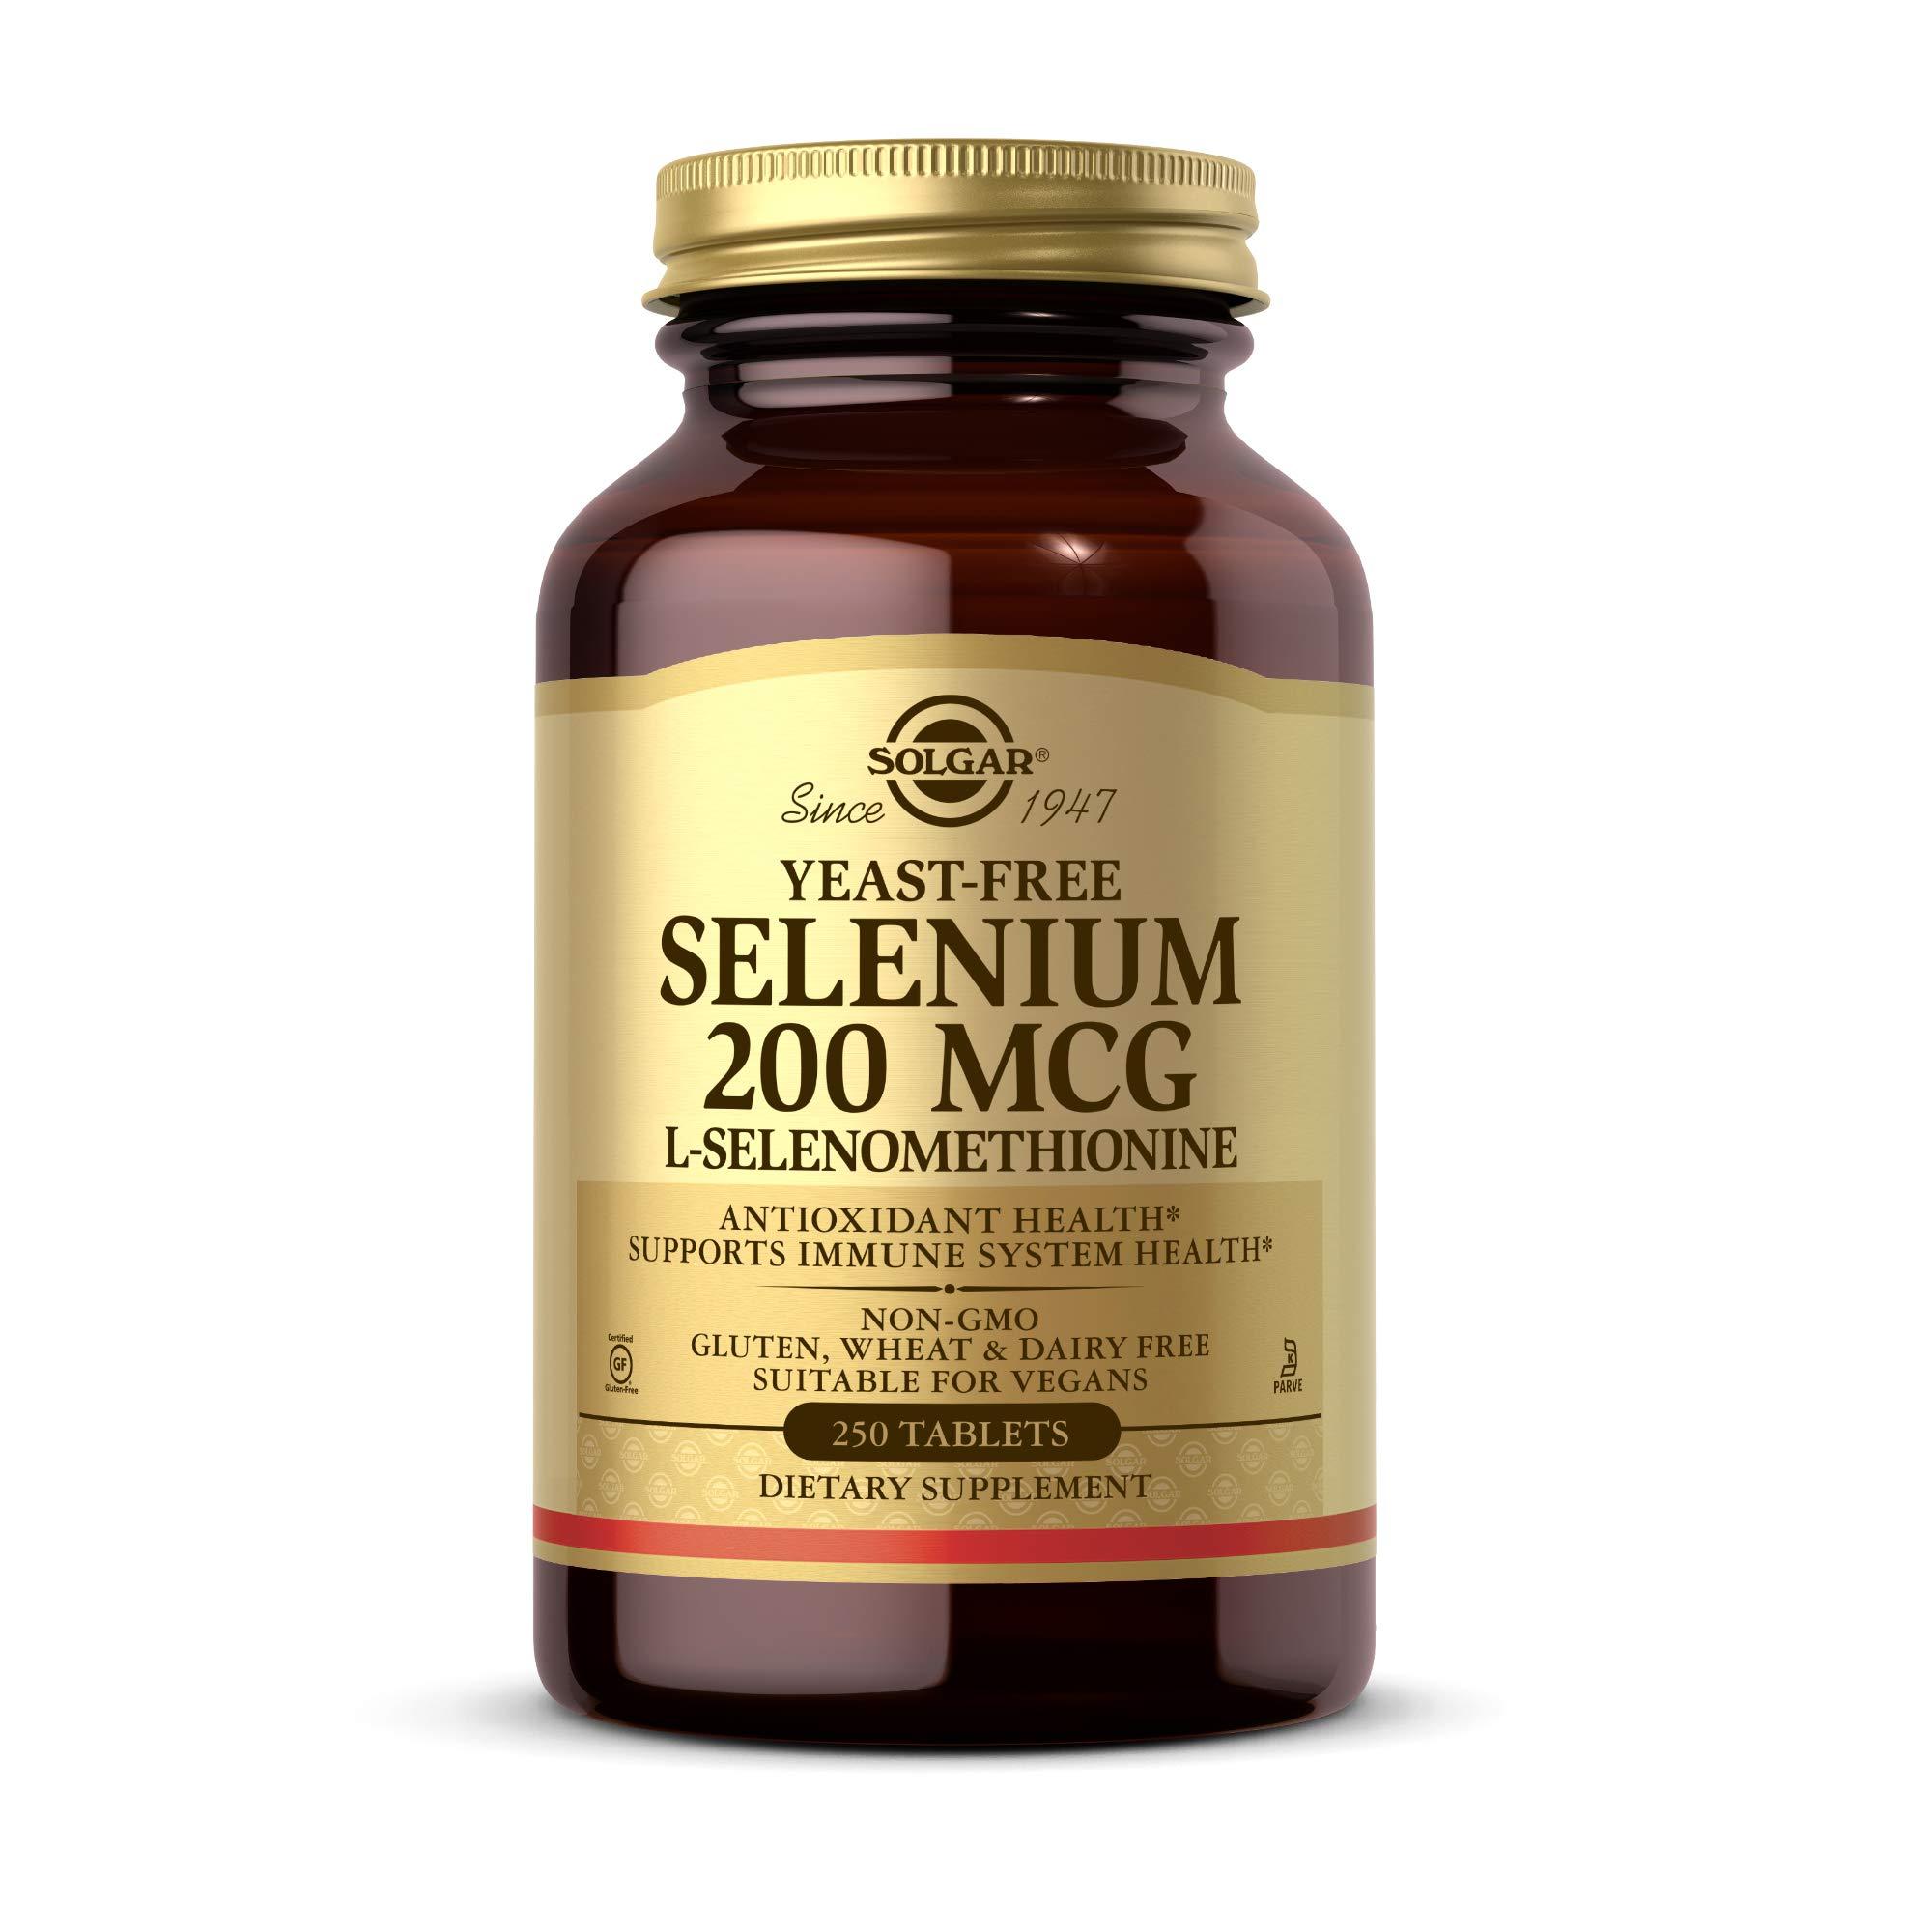 Solgar Yeast-Free Selenium 200 mcg, 250 Tablets - Supports Antioxidant & Immune System Health - Non-GMO, Vegan, Gluten Free, Dairy Free, Kosher - 250 Servings